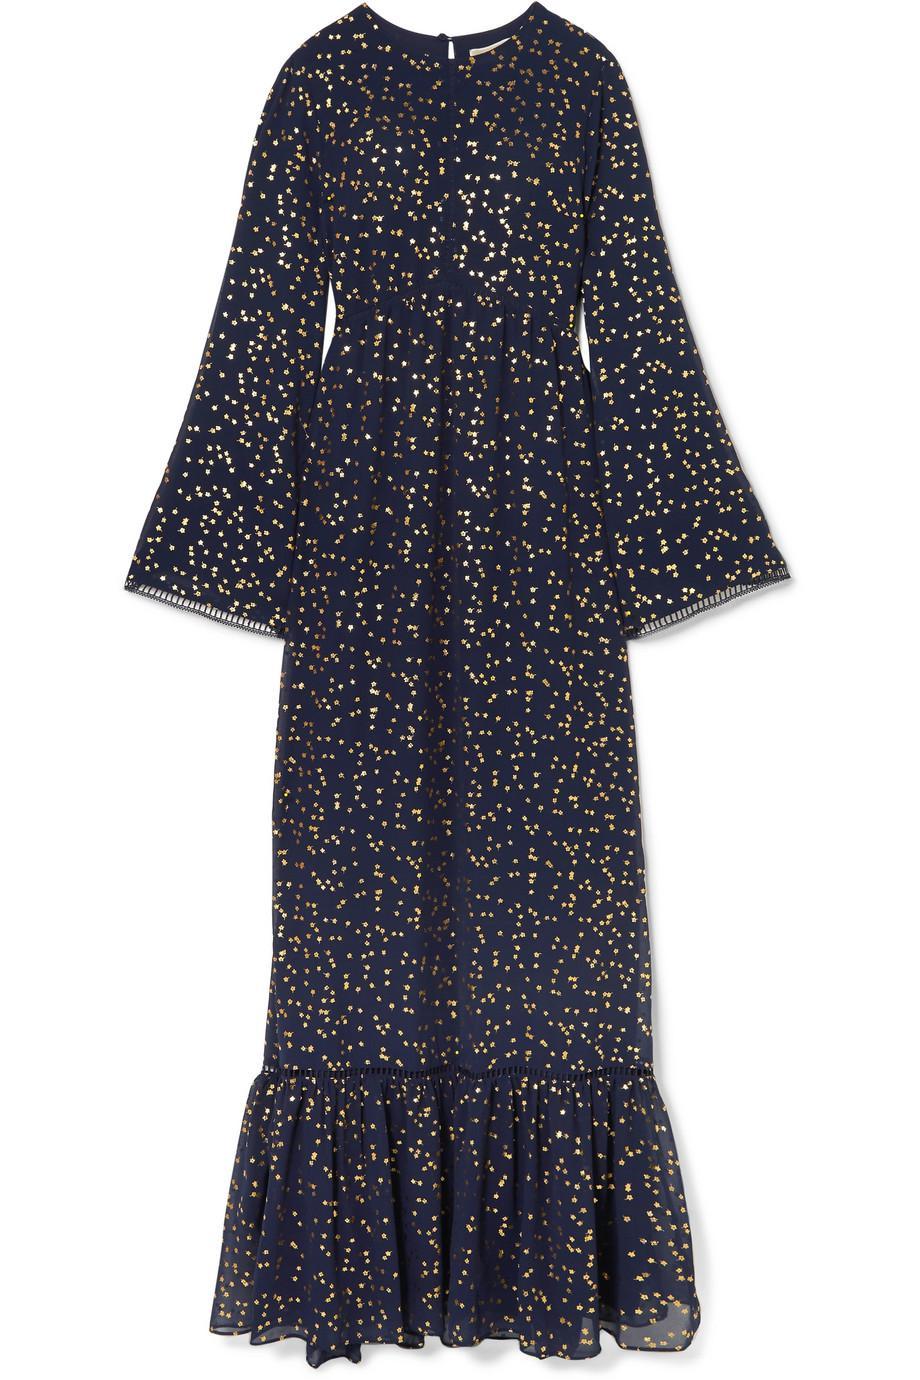 Lattice-trimmed Printed Georgette Maxi Dress - Navy Michael Kors iSGRLUW